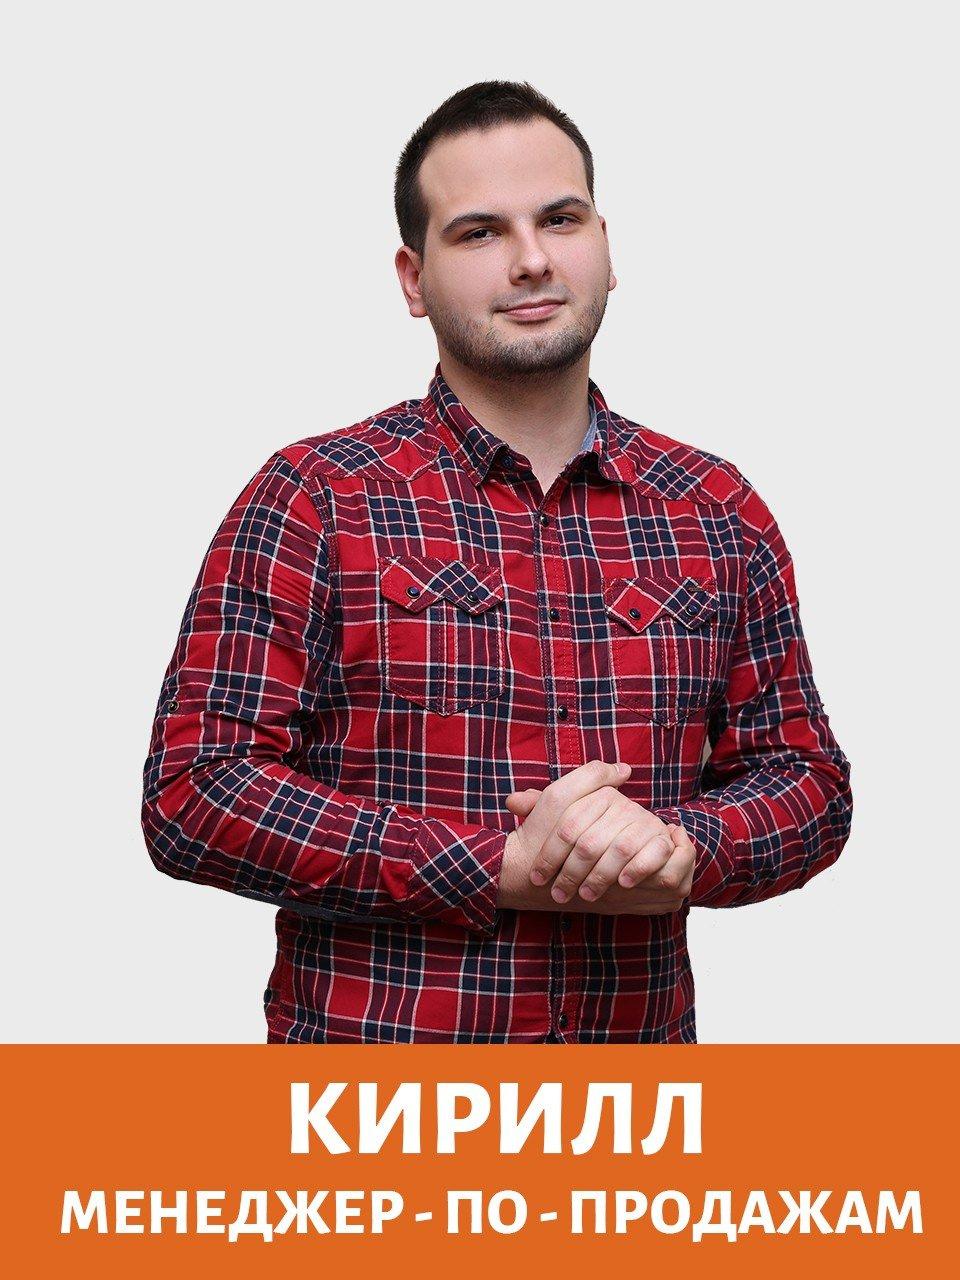 kirill menedzhe po prodazham - Главная